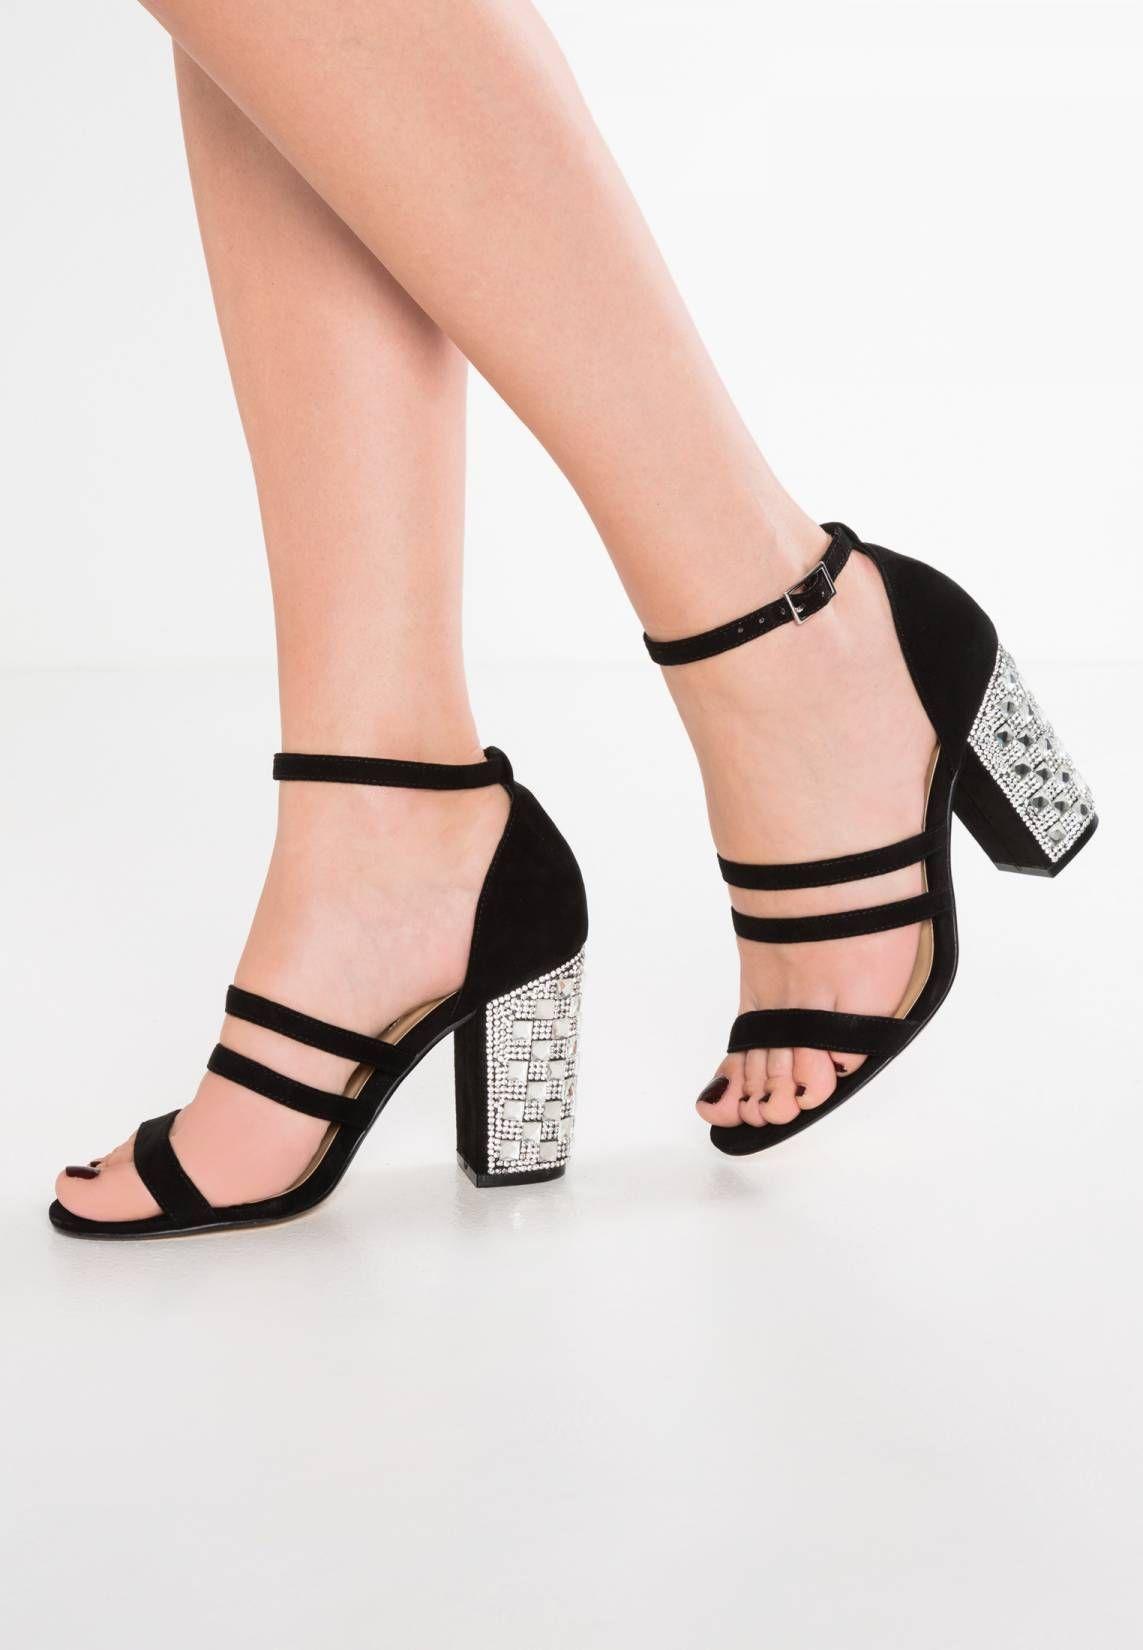 7e072b058ff8 SHADOW - High heeled sandals - black. Pattern plain. Sole synthetics. heel  height 3.5